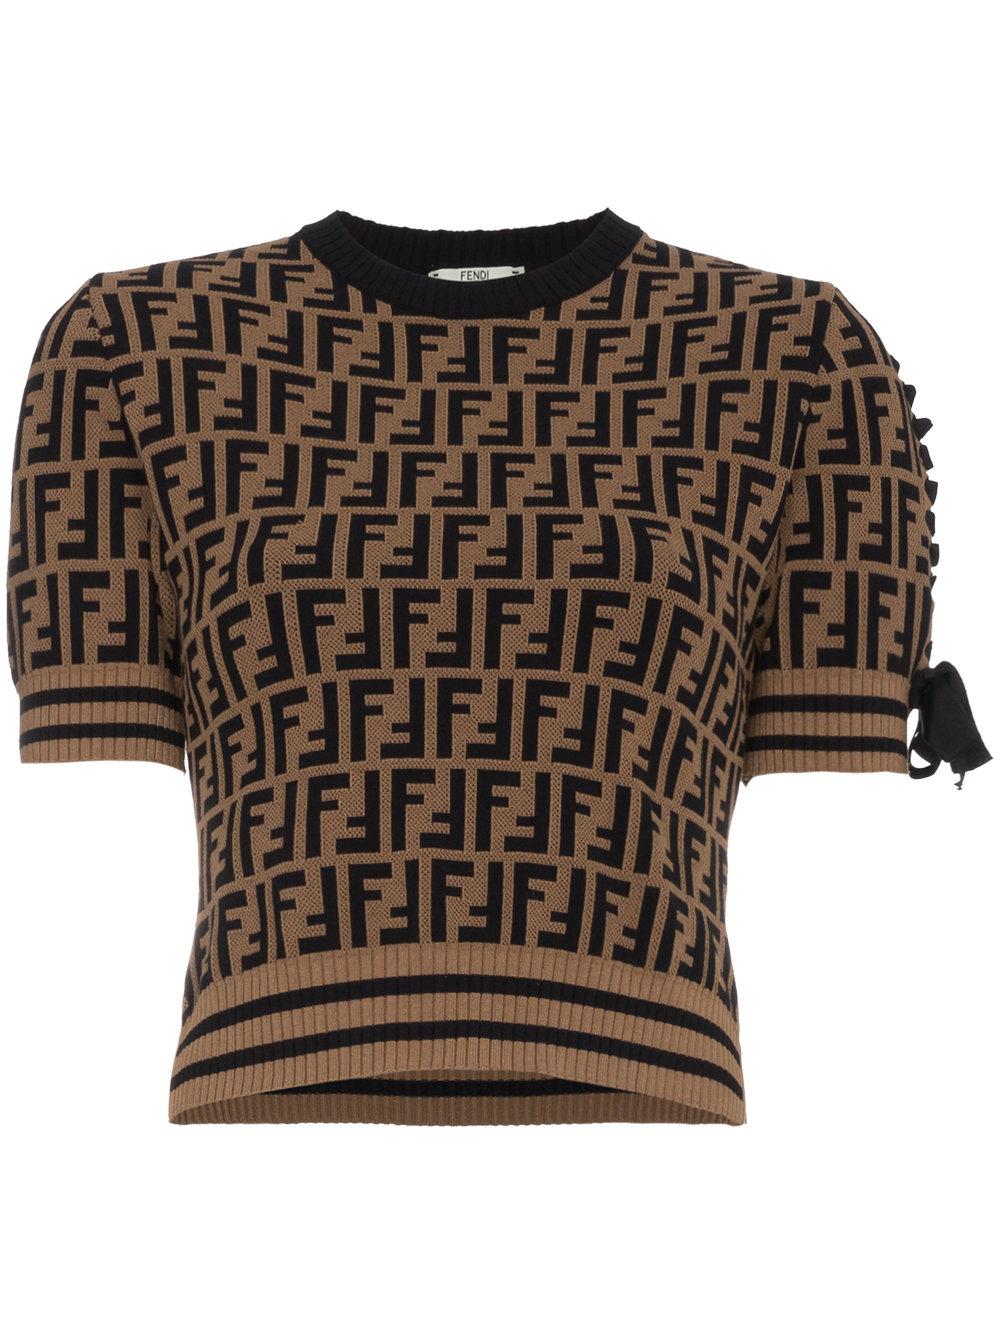 Get the Look: Larsa's Knitted Fendi Top, fends, fending top, larsa pippen